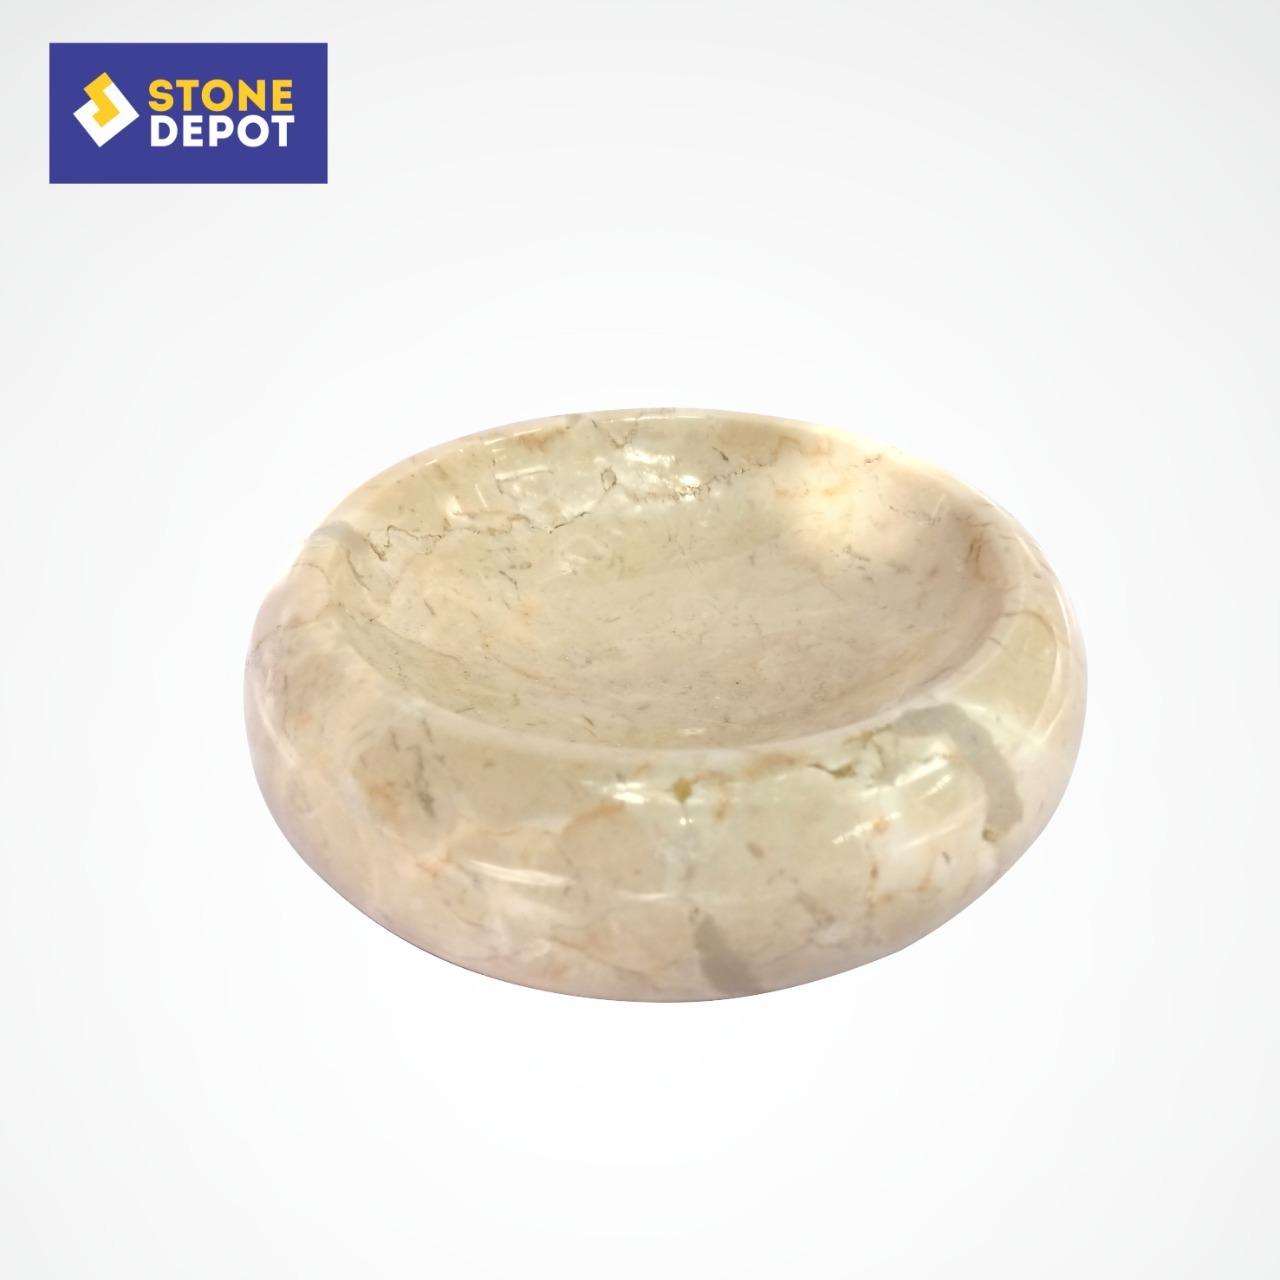 Bali Beige Marble Bathroom Stone Soap Dish